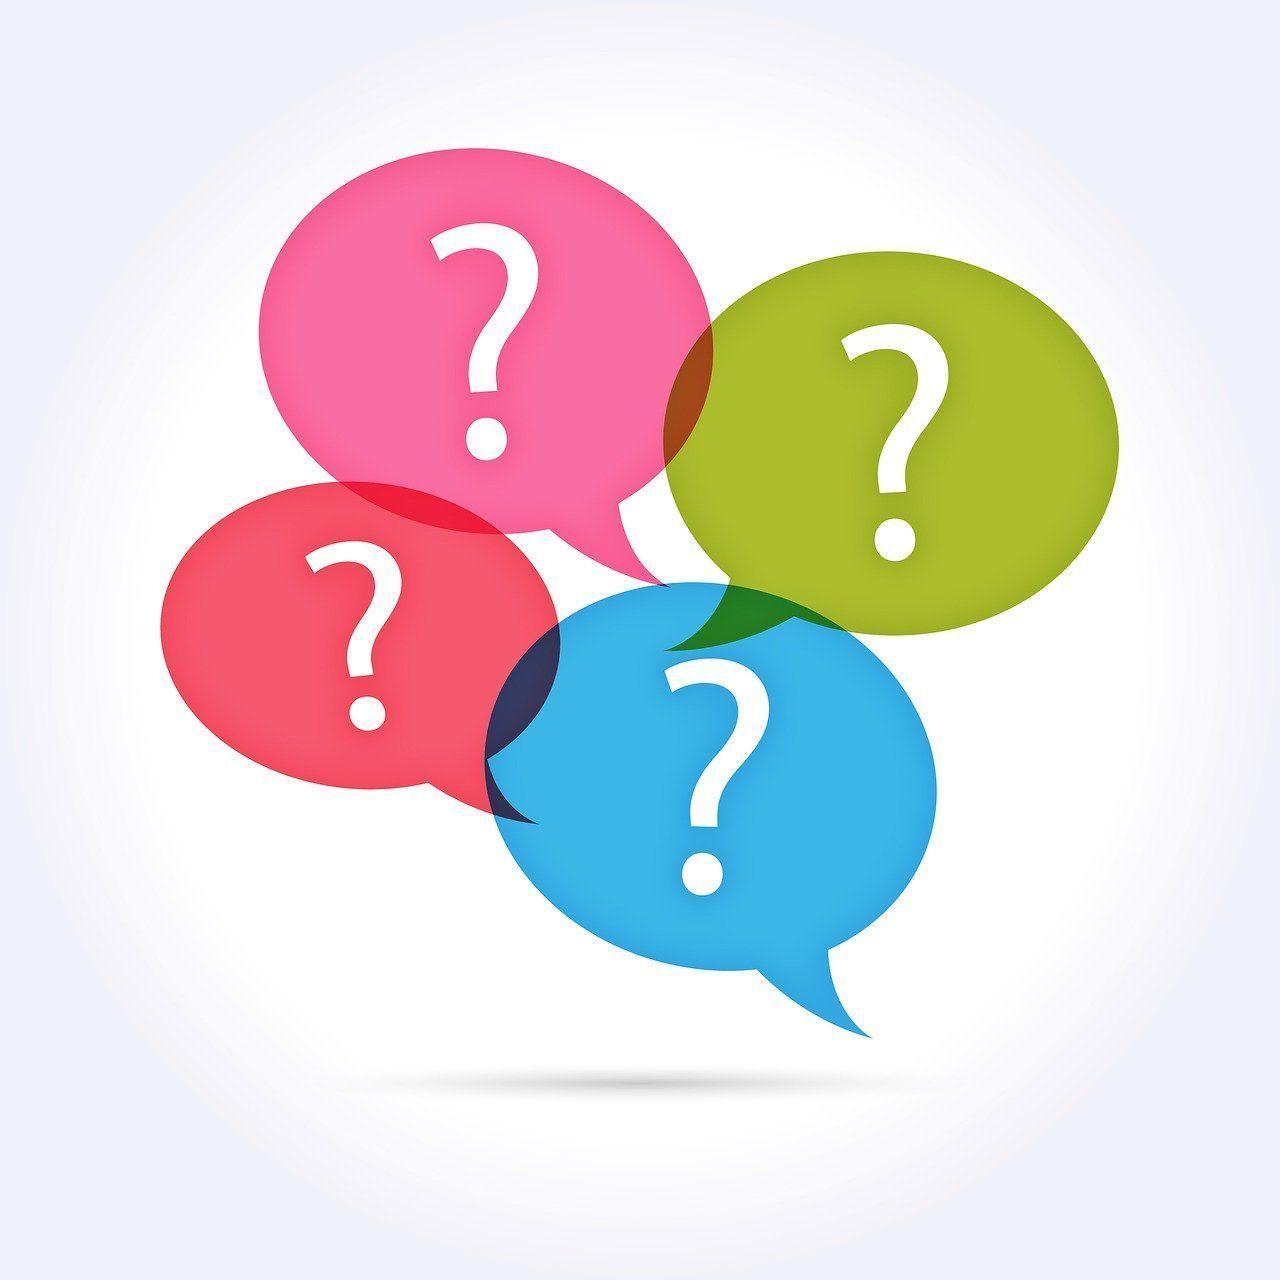 FAQ / Häufig gestellte Fragen - FAQs & Support